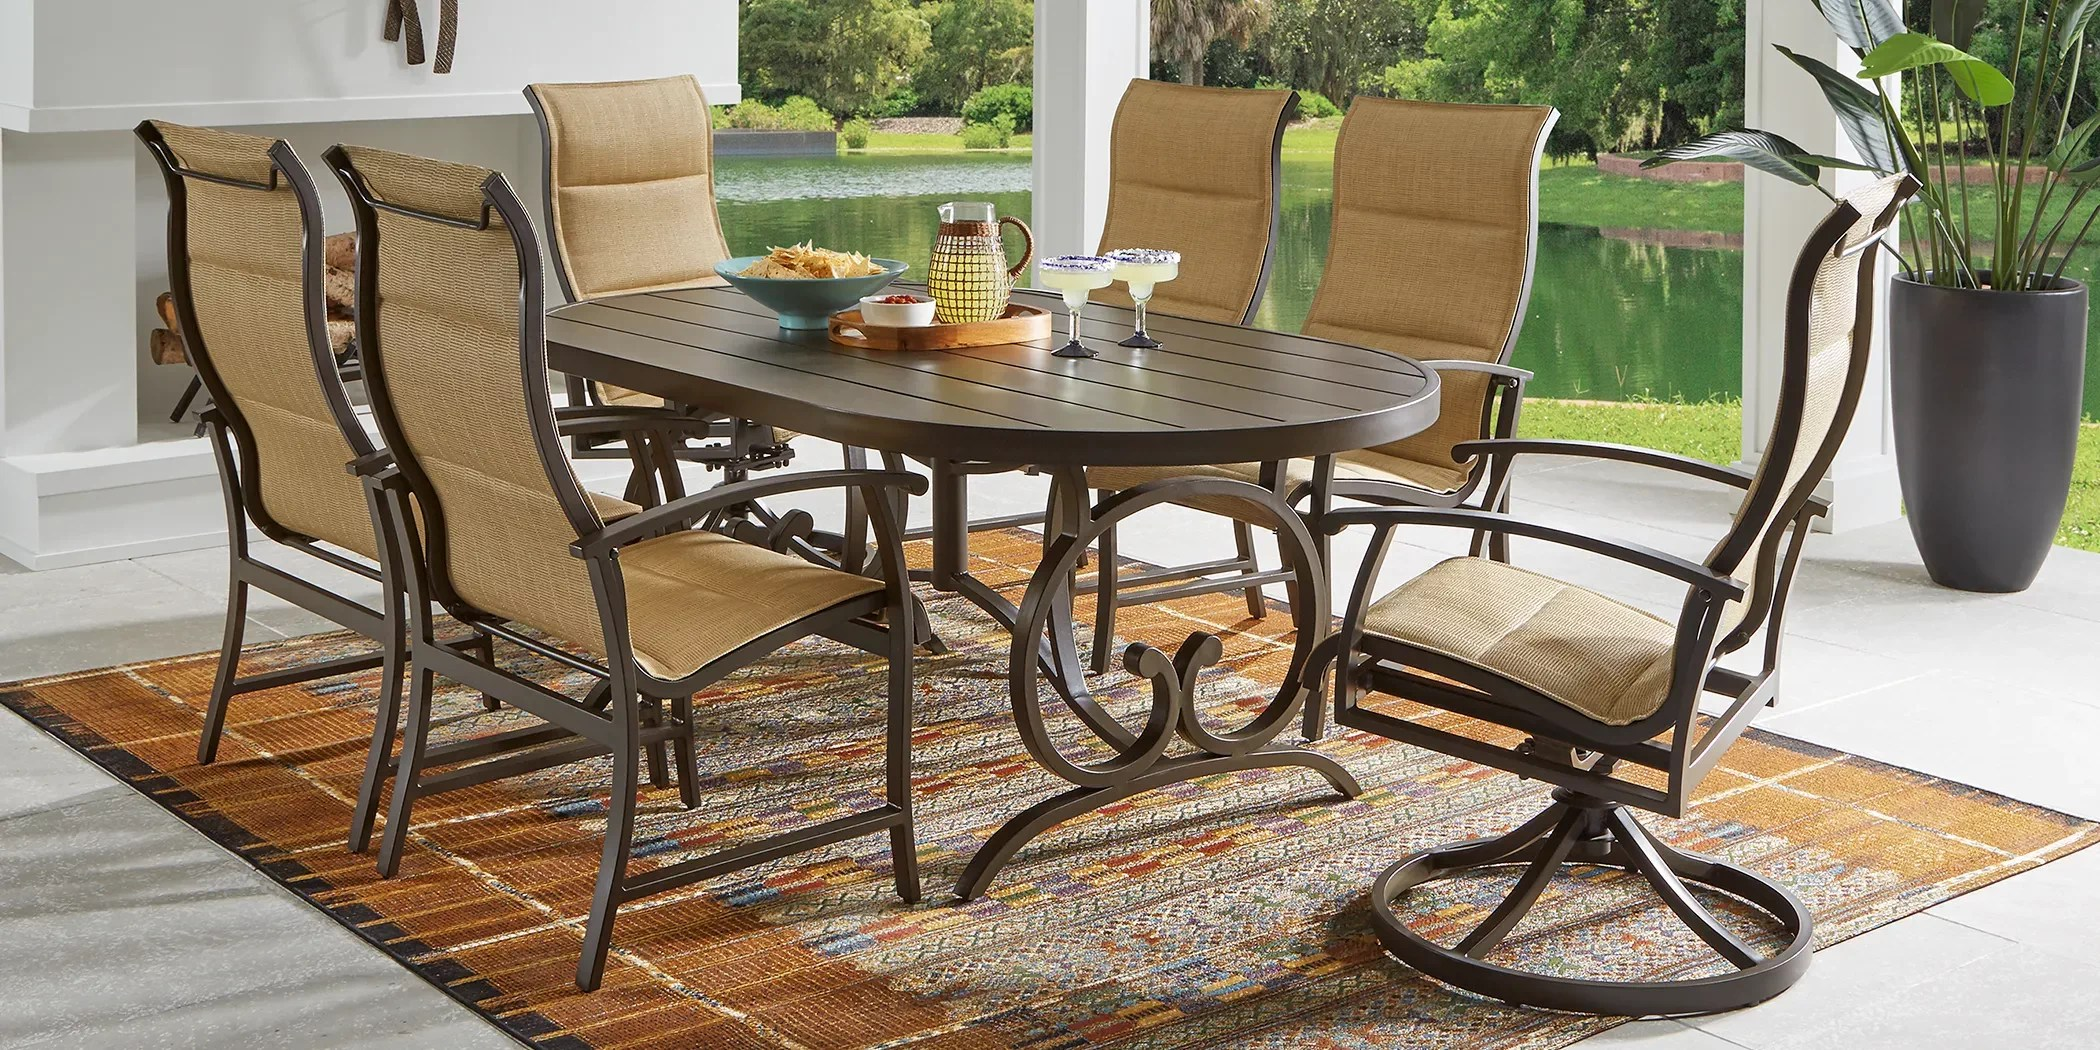 outdoor 5 piece patio dining sets